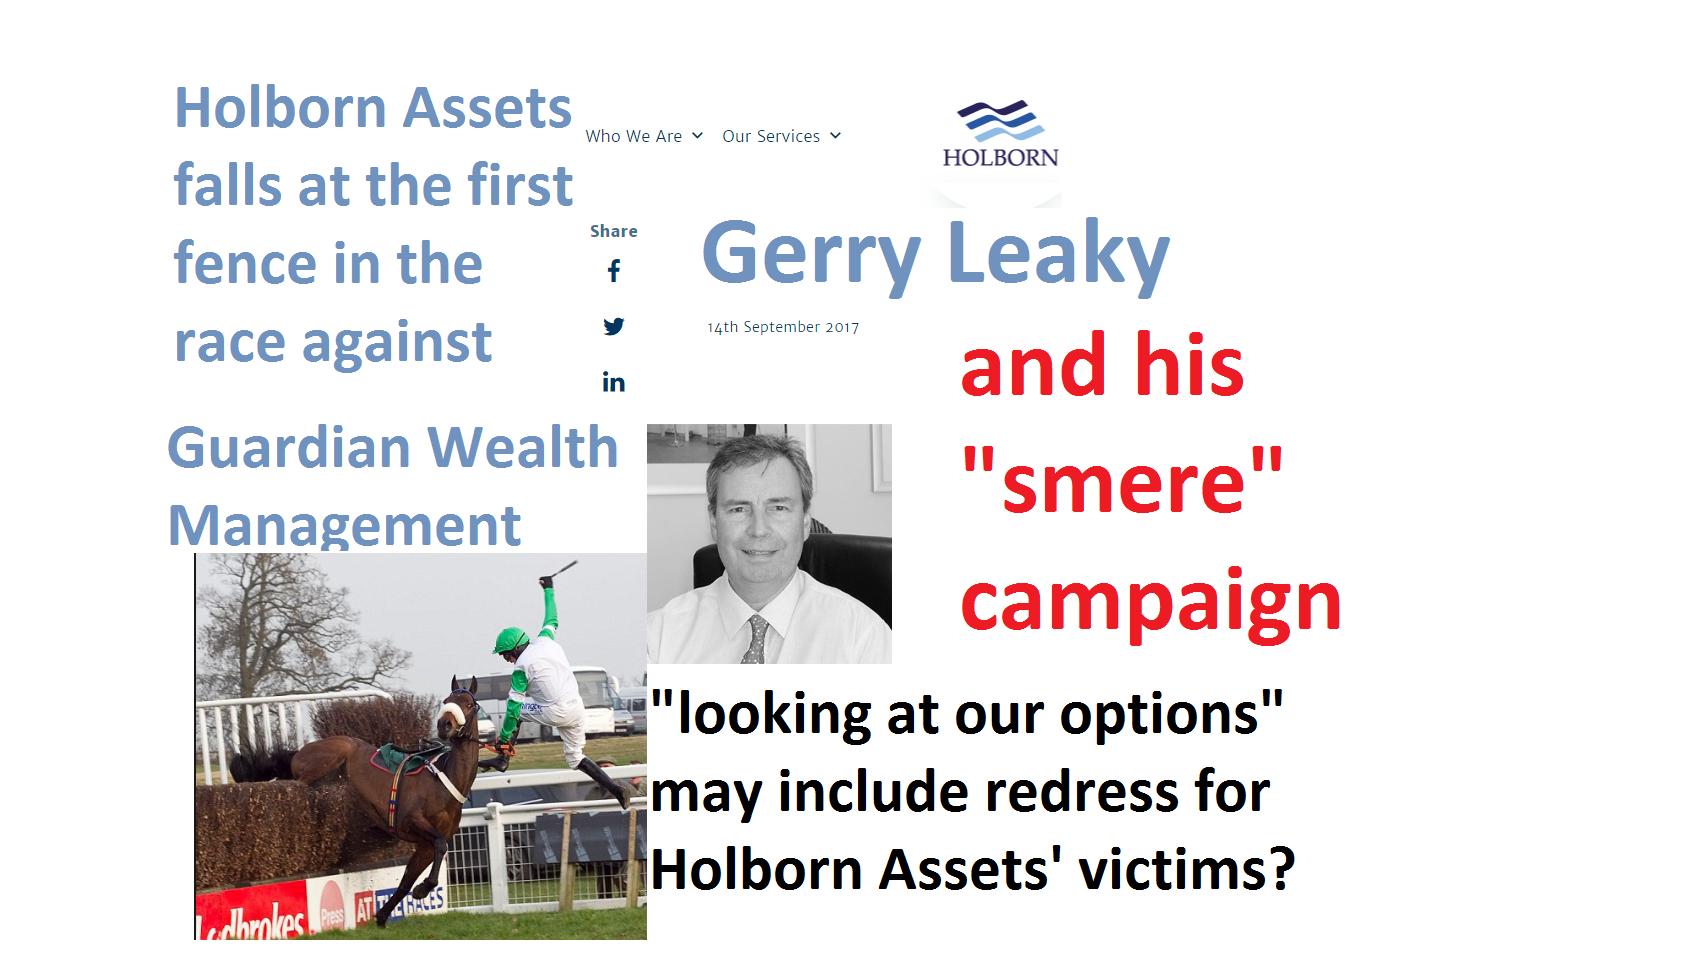 Gerry Leaky